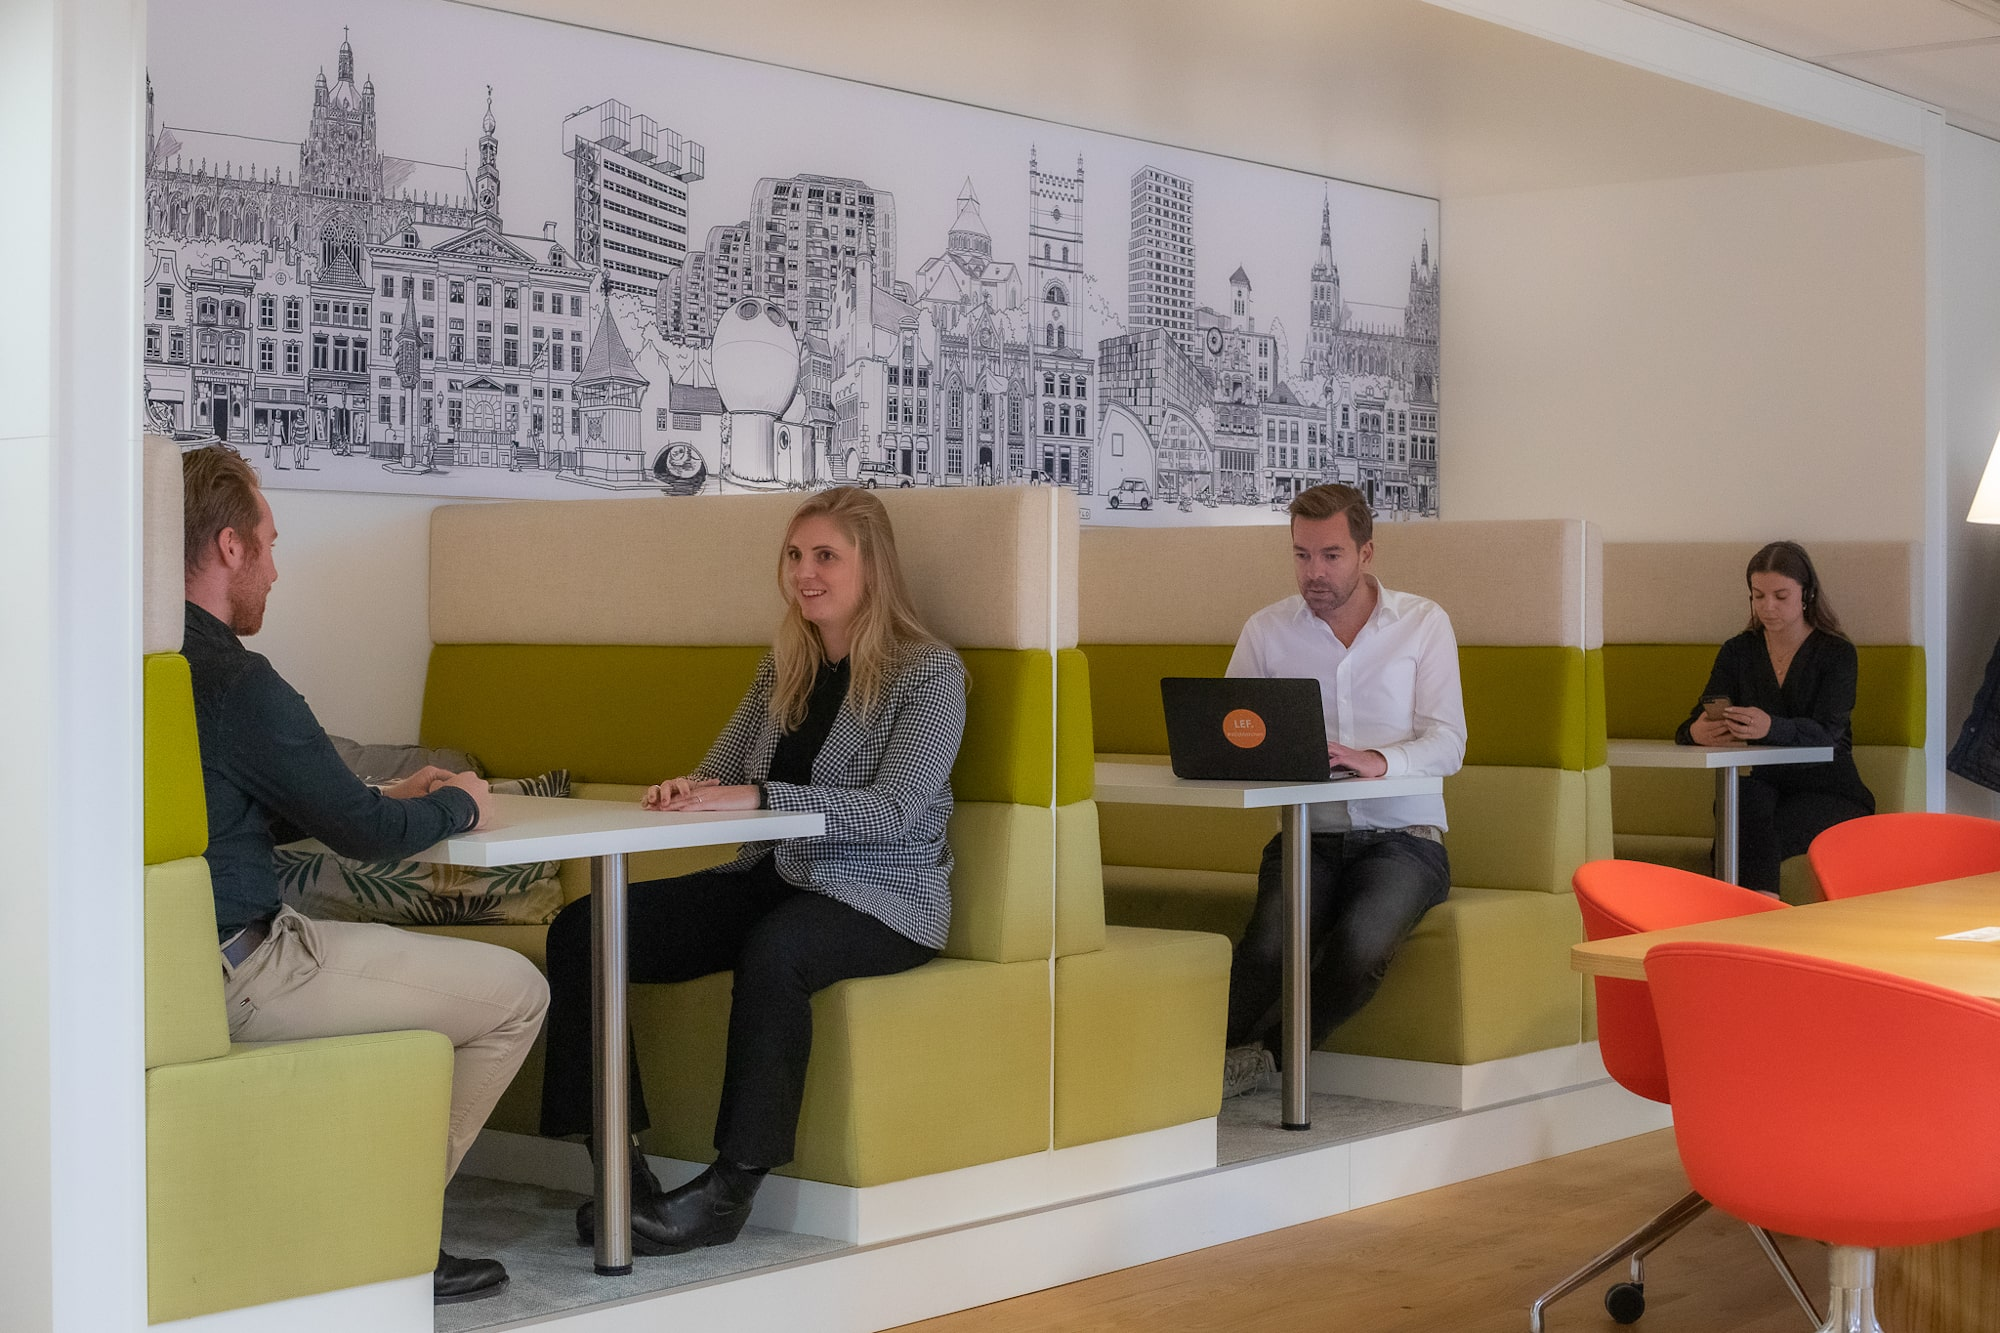 LEF Recruitment, vacatures regio Den Bosch, Vacatures den Bosch, Vacatures Noord Brabant